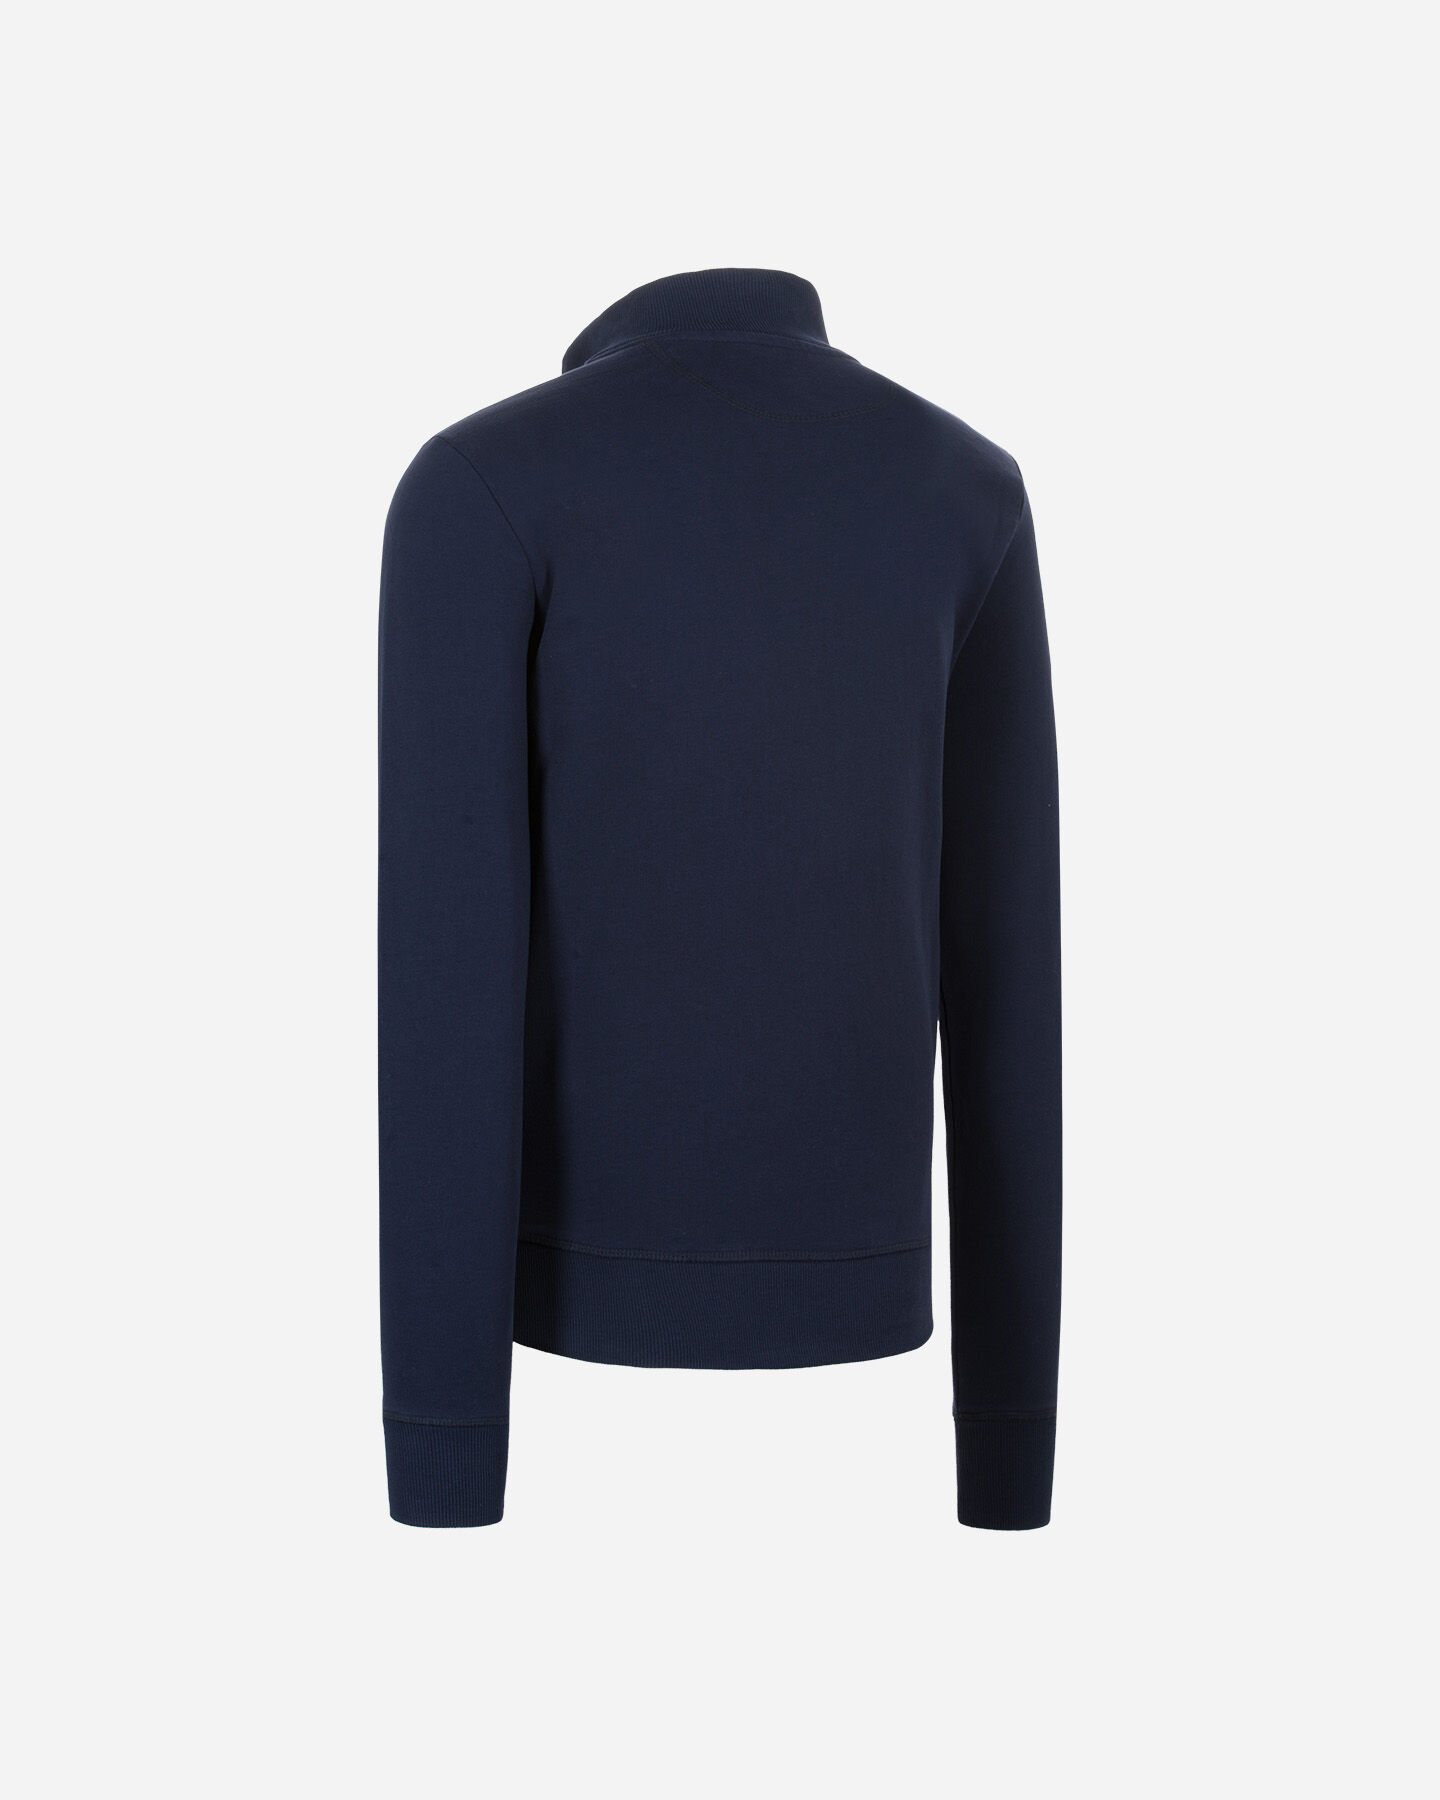 Felpa North Sails Full Zip Sweater M 6920180950 | Cisalfa Sport